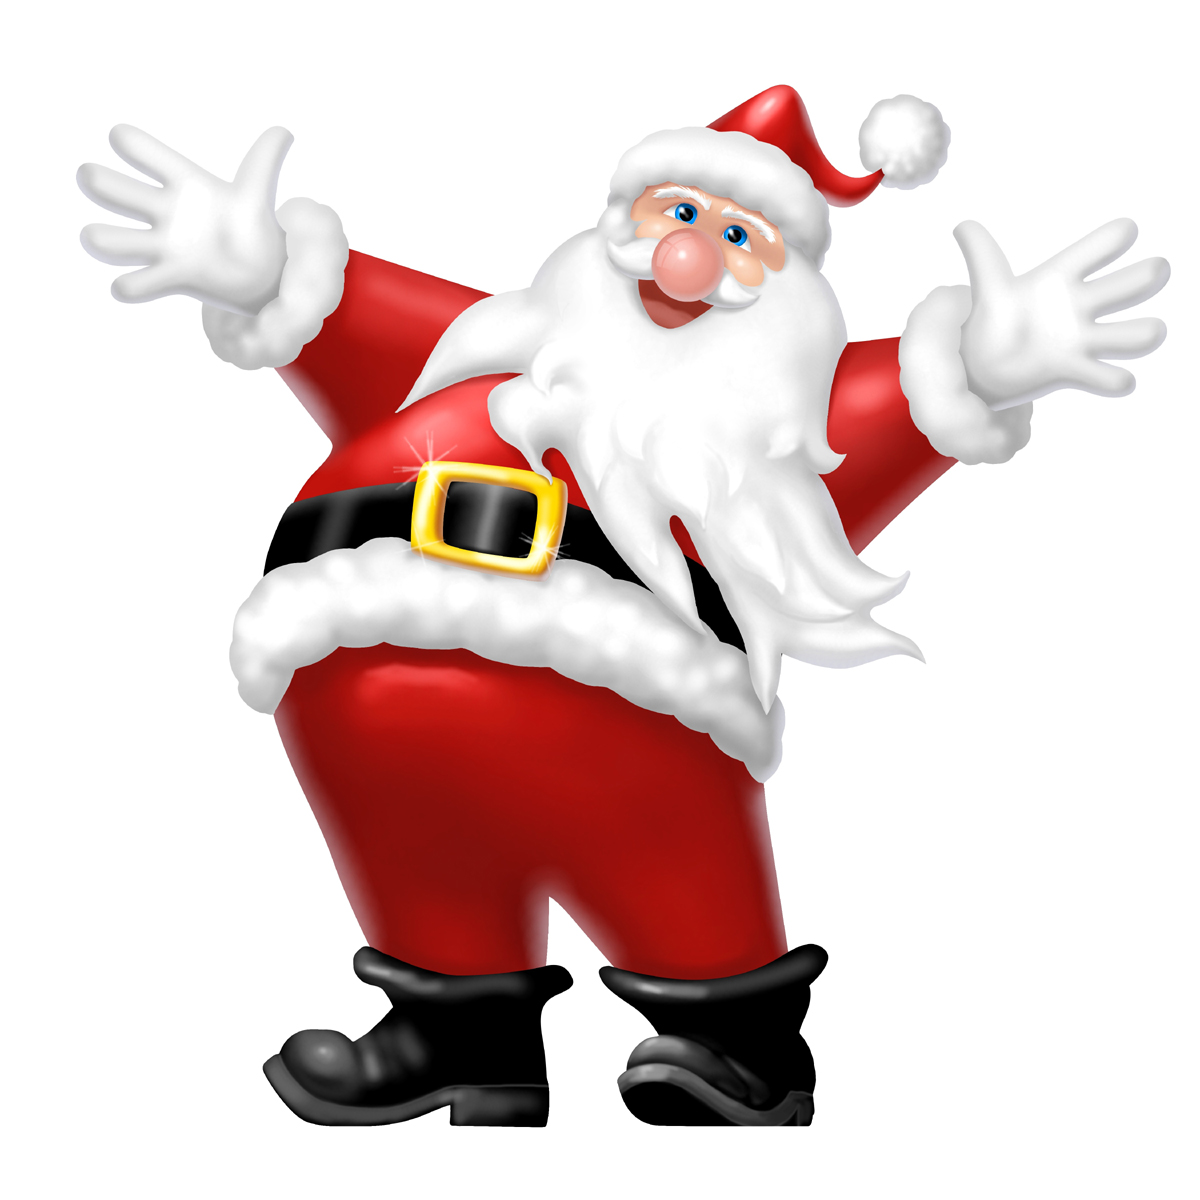 Free Jesus Christ Christmas Wallpapers And